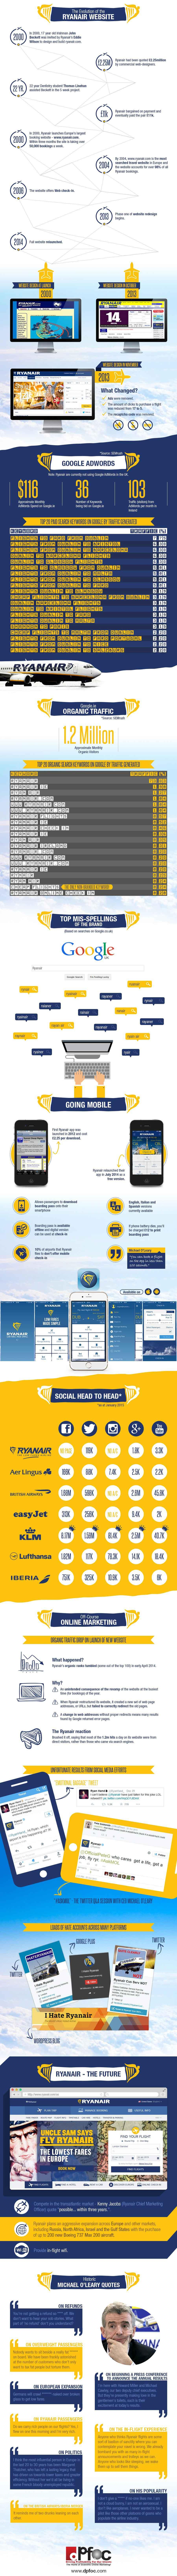 Ryanair-Website-Evolution